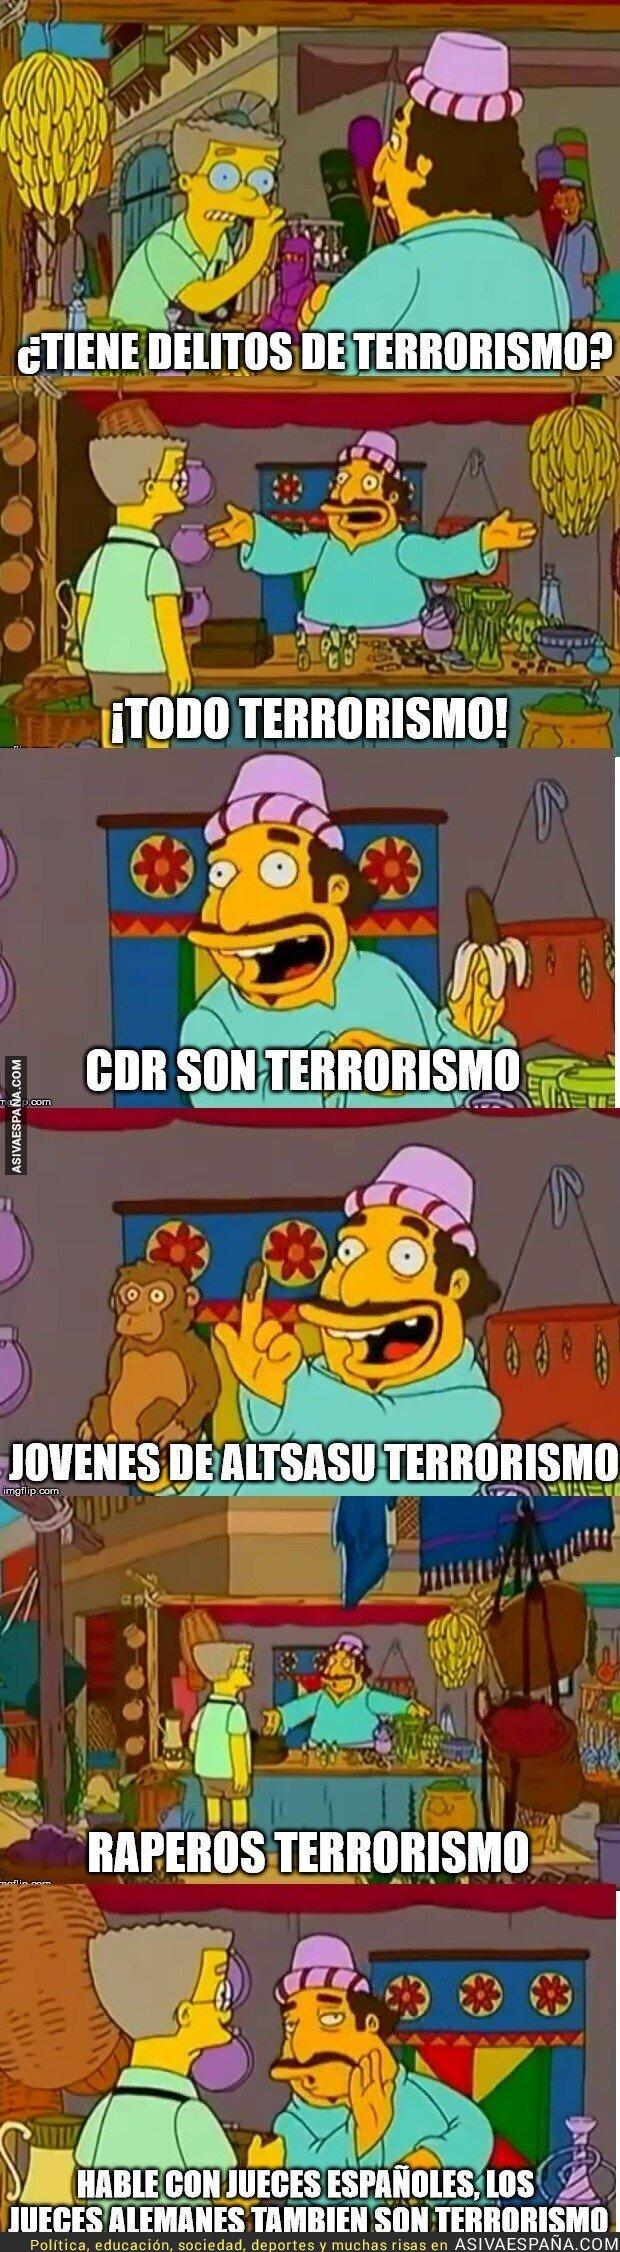 85592 - ¡Todo terrorismo!